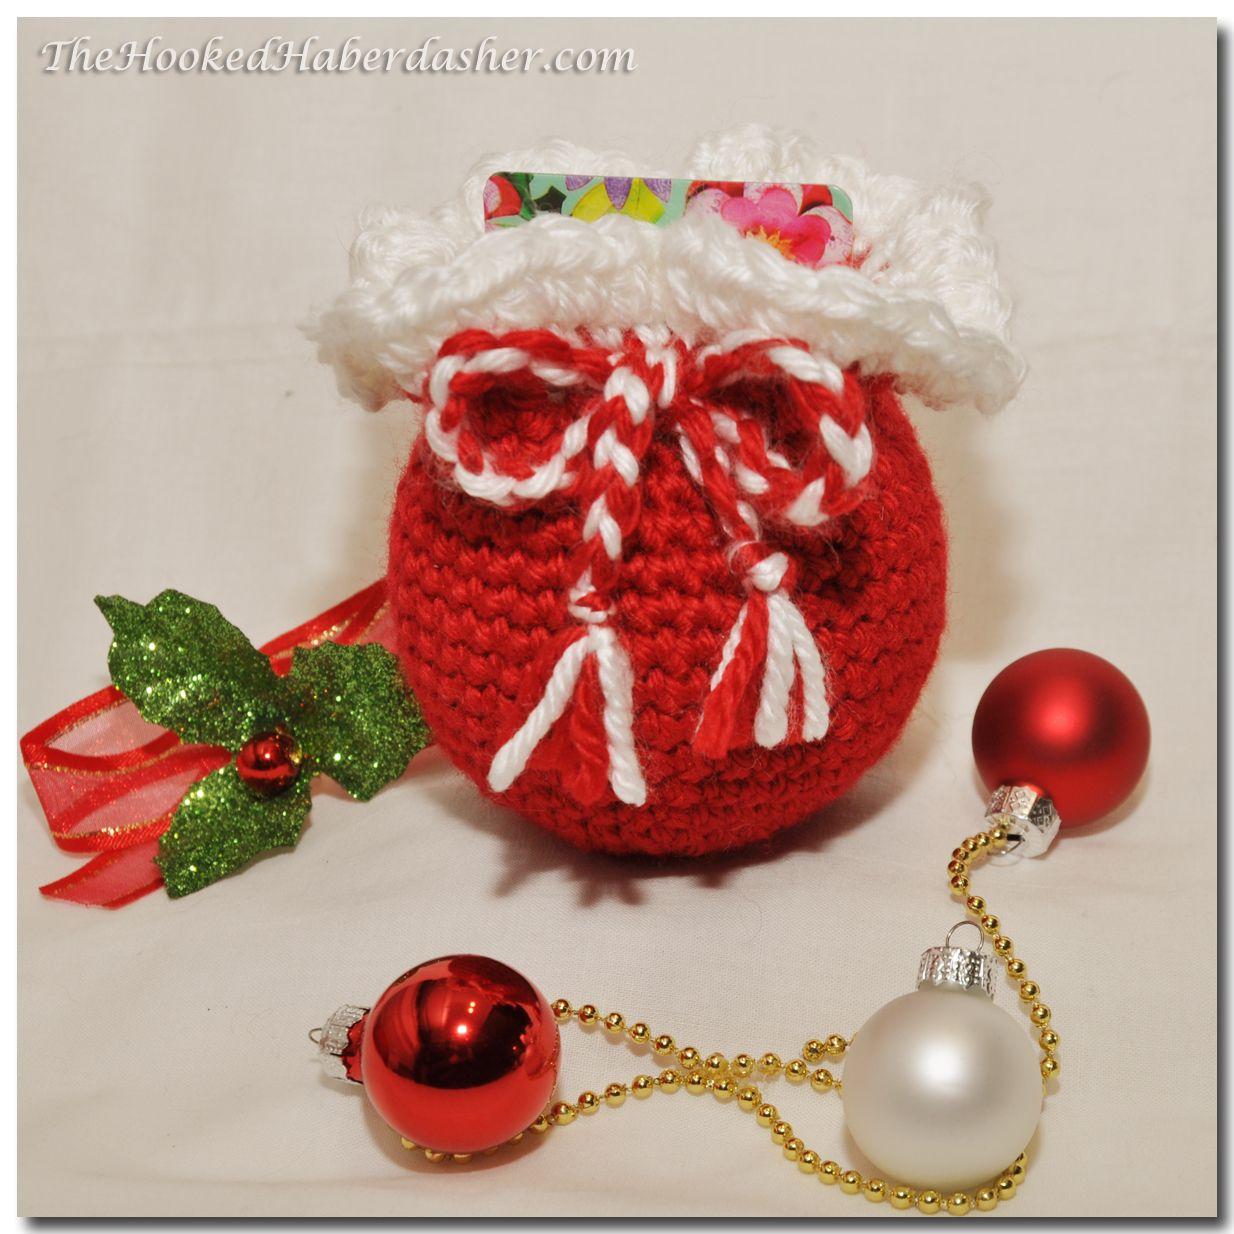 Free Santa\'s Sack Gift Card Holder Ornament2 | Christmas Time ...